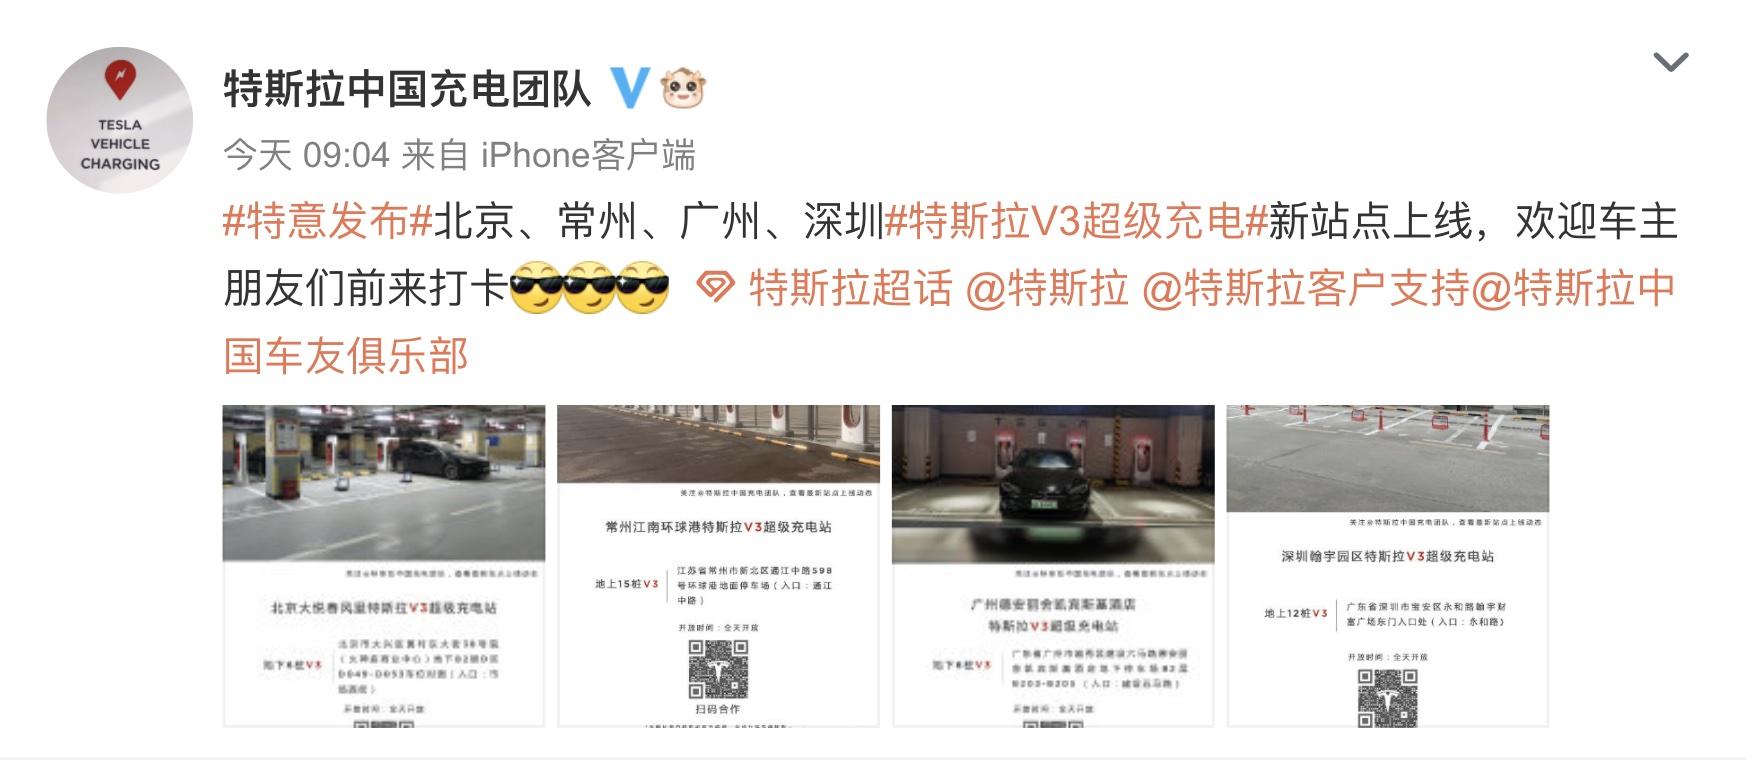 Tesla-china-supercharger-network